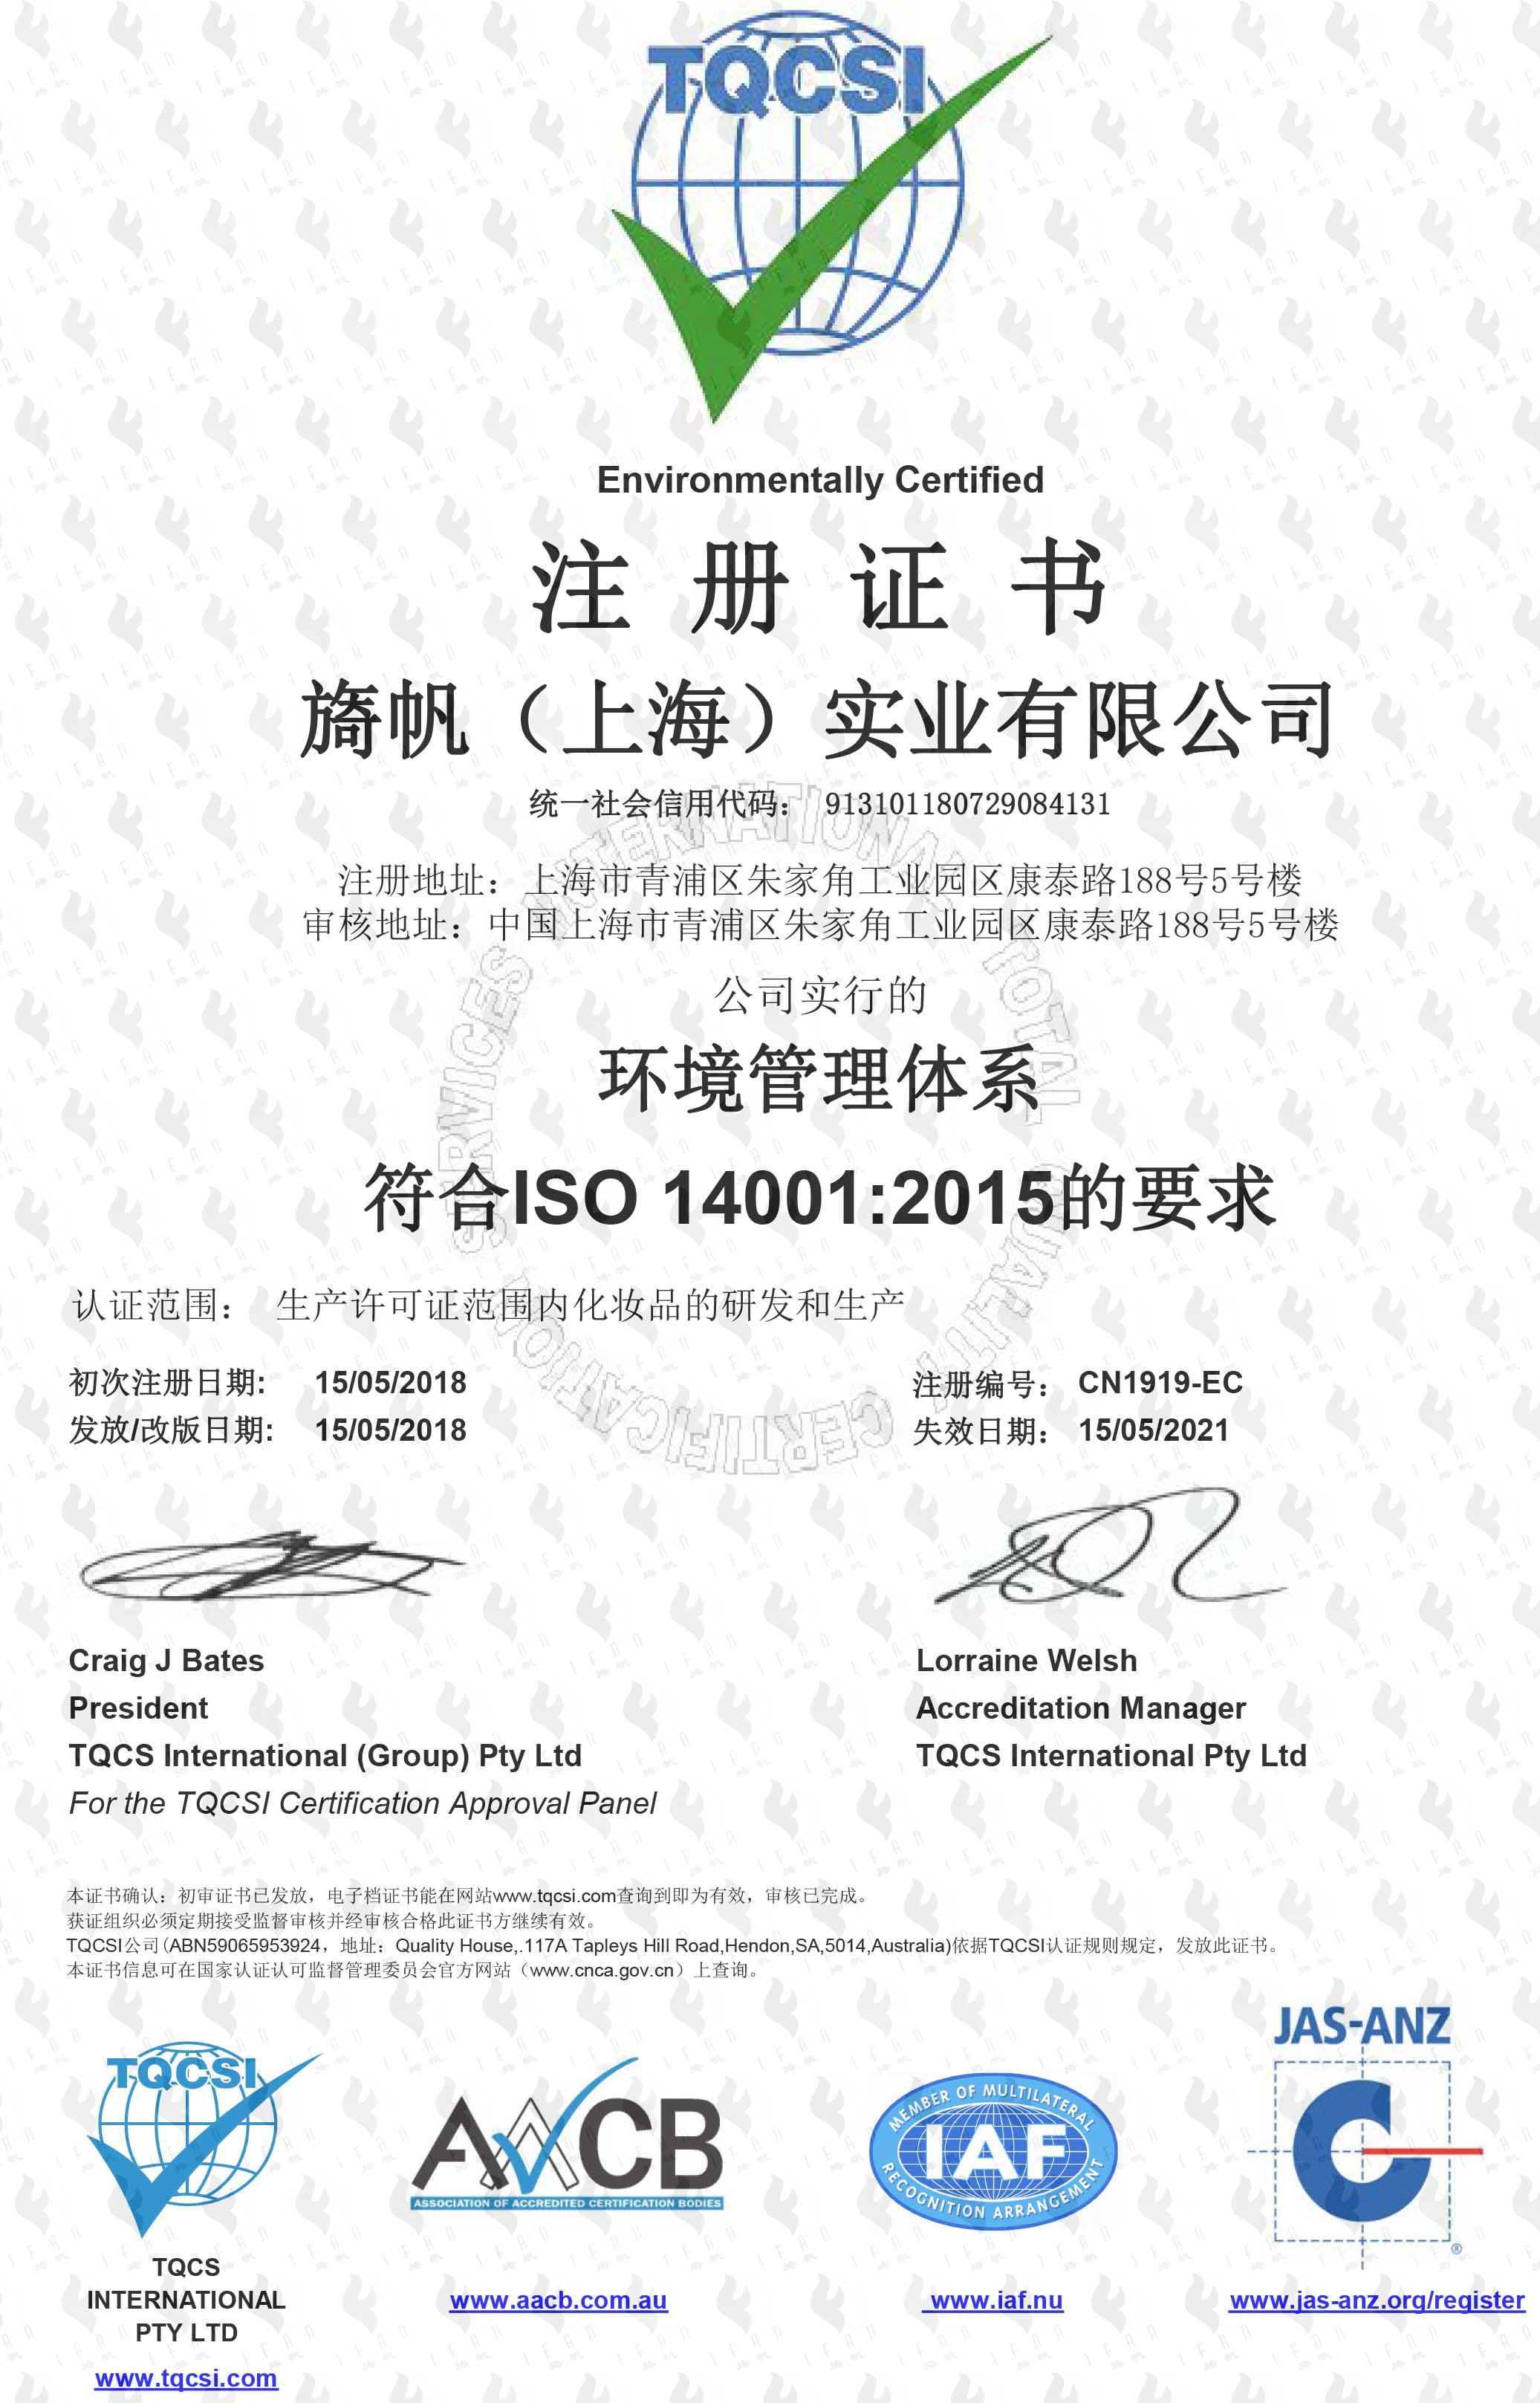 IOS14001環境管理體系